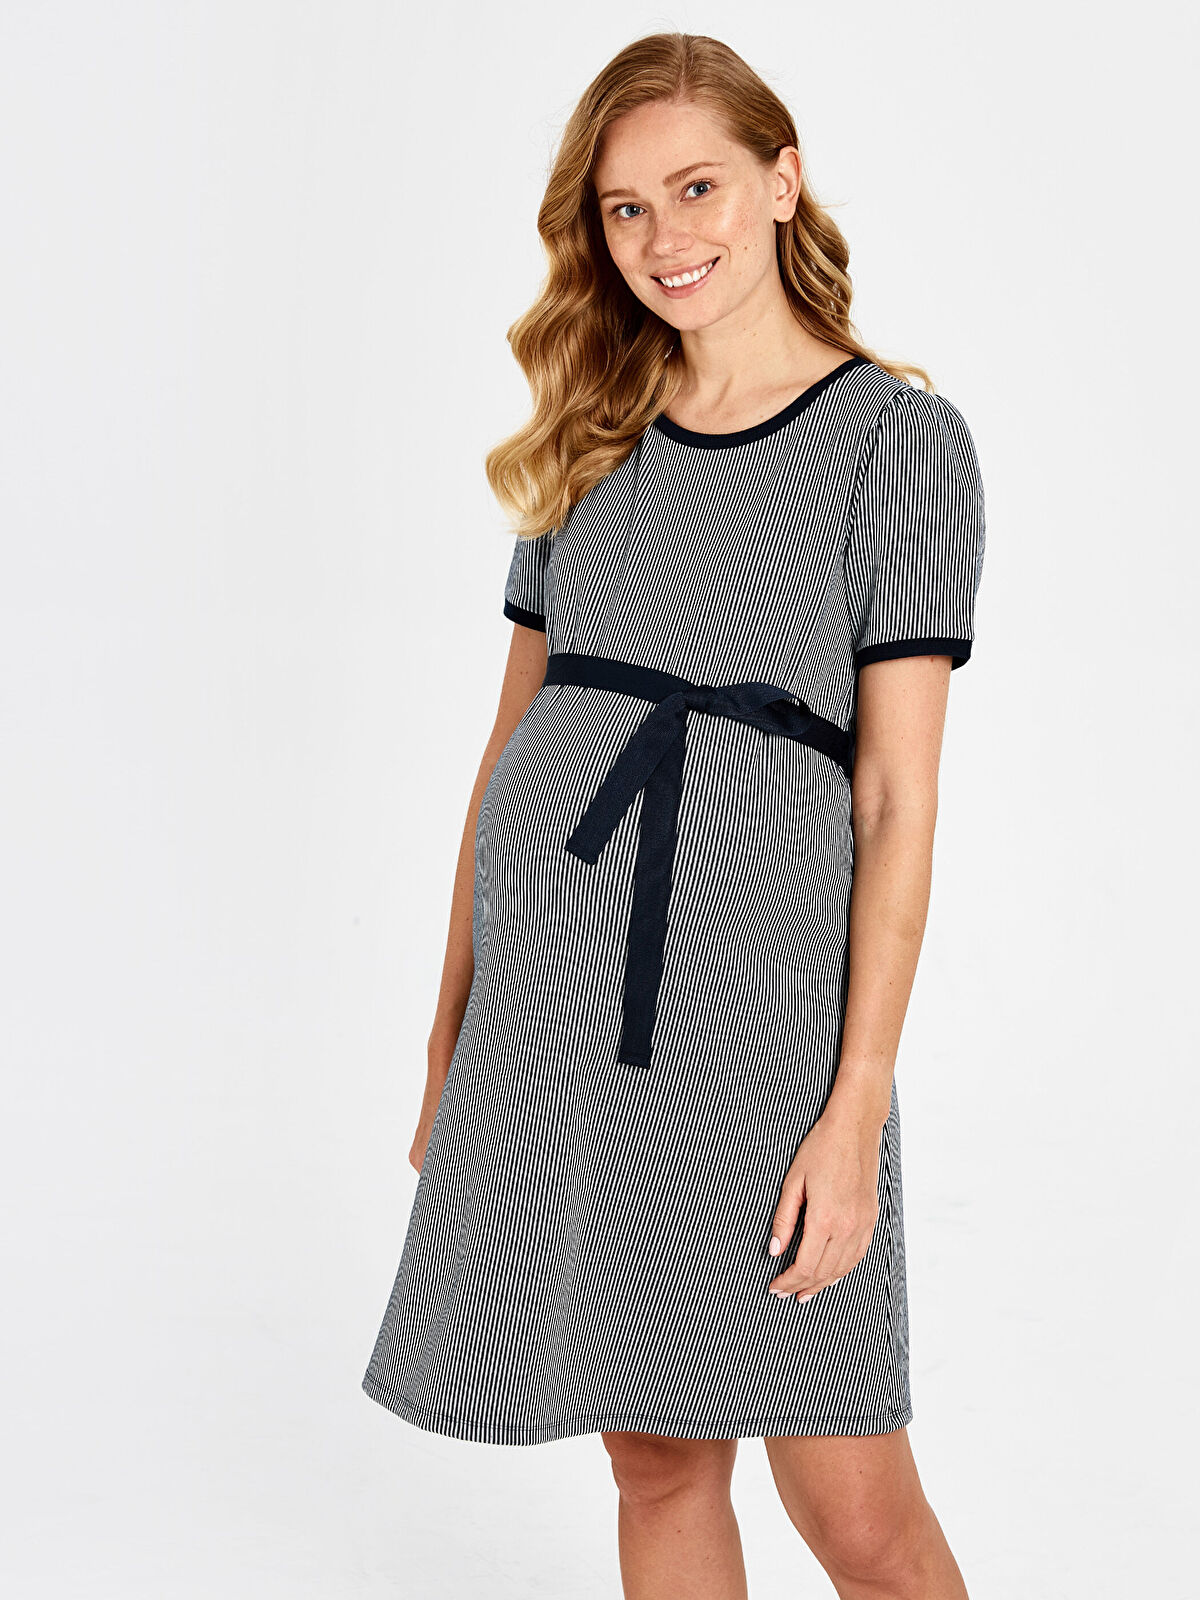 Kuşaklı Çizgili Hamile Elbise - LC WAIKIKI